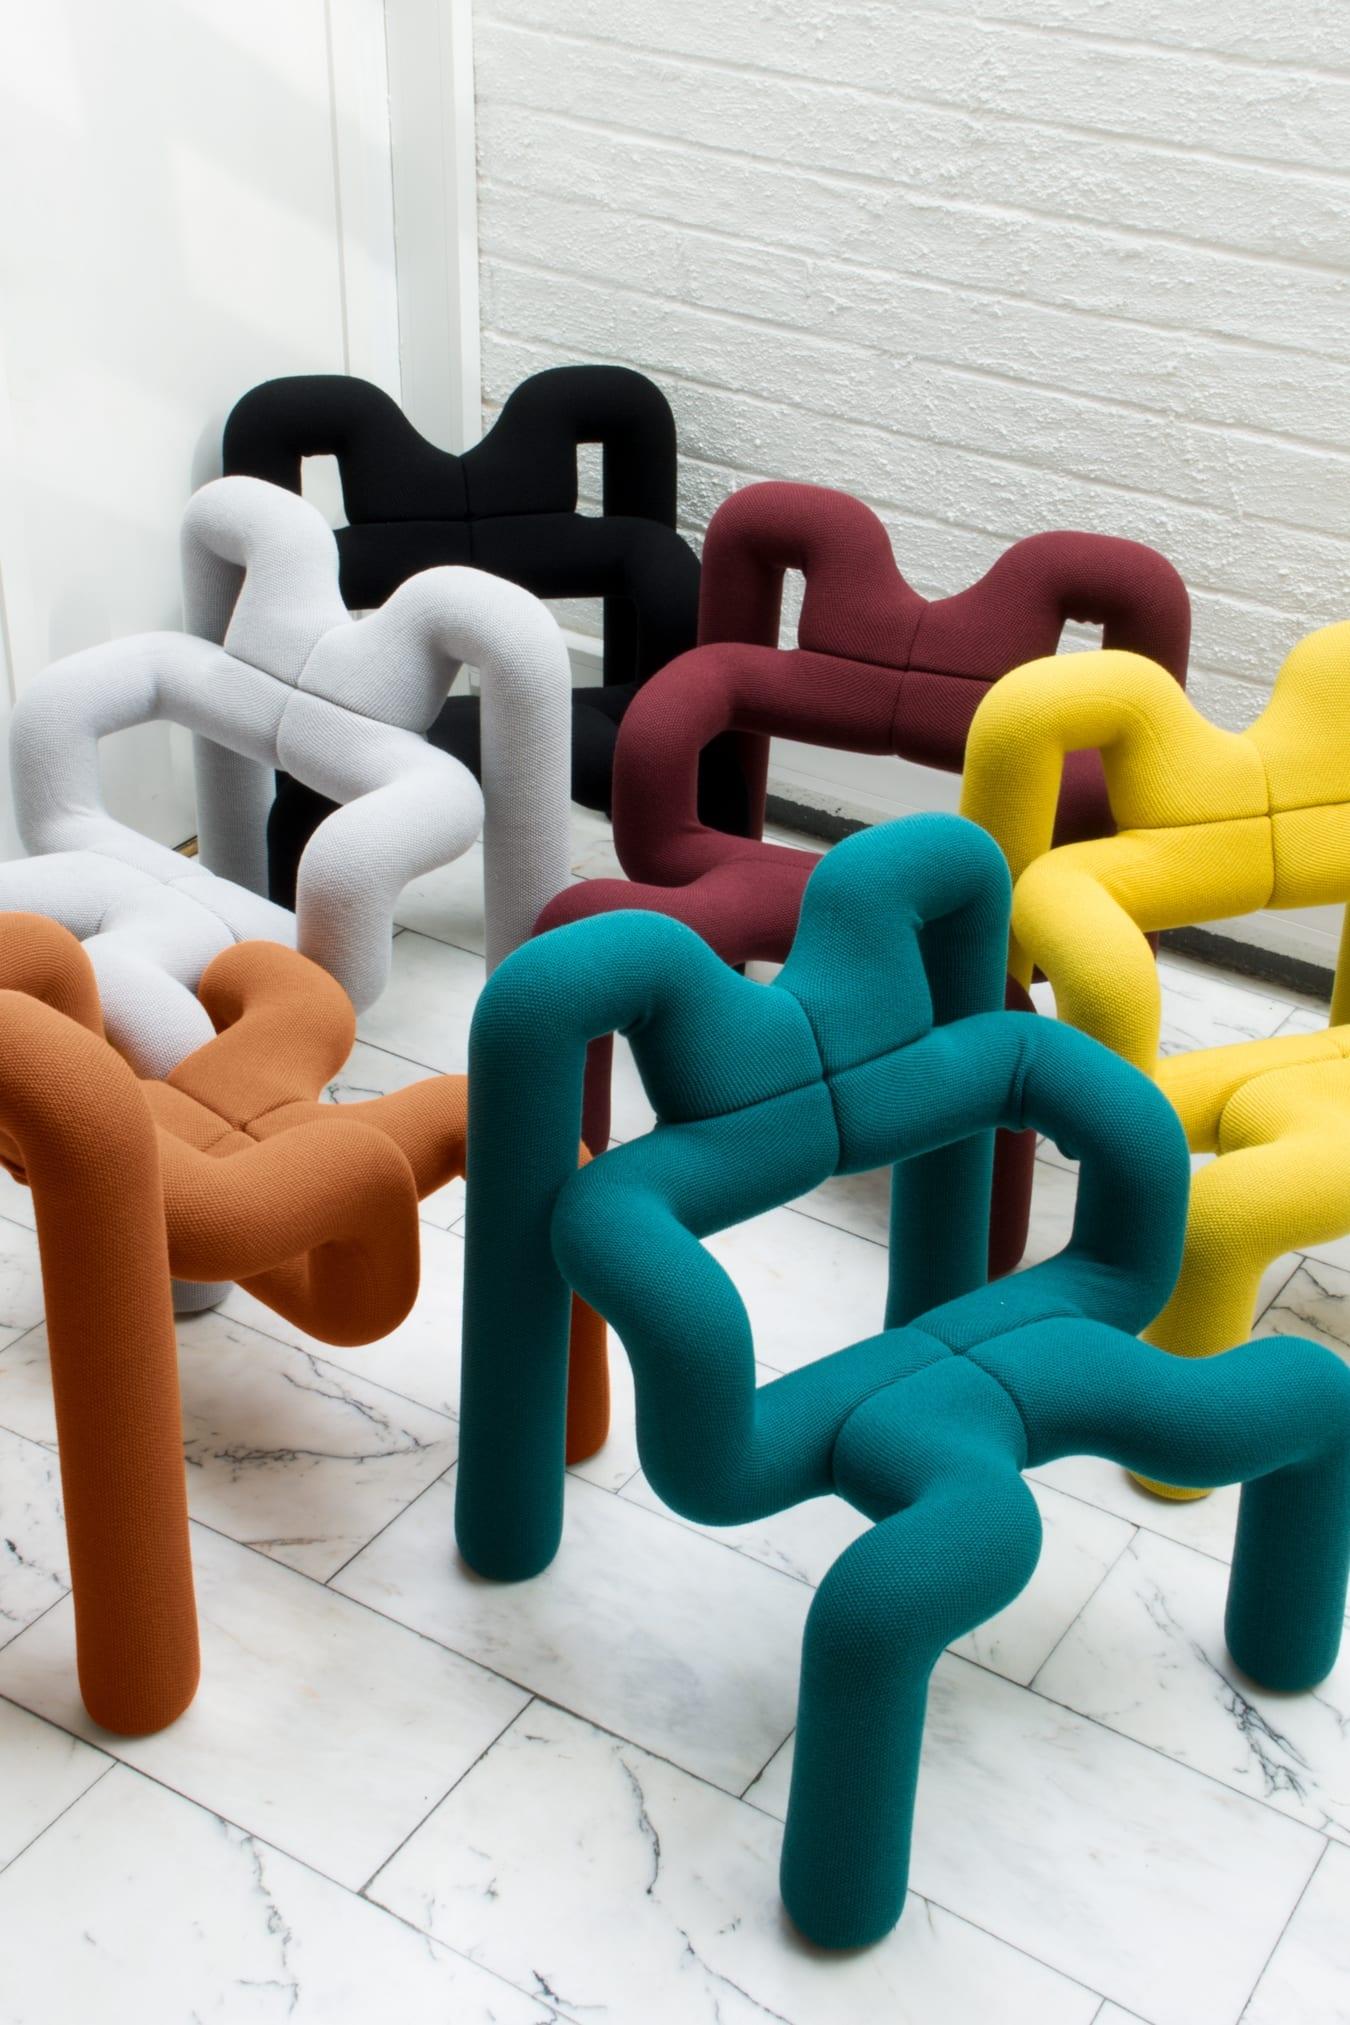 Sculptural seating - '80s interior design trends